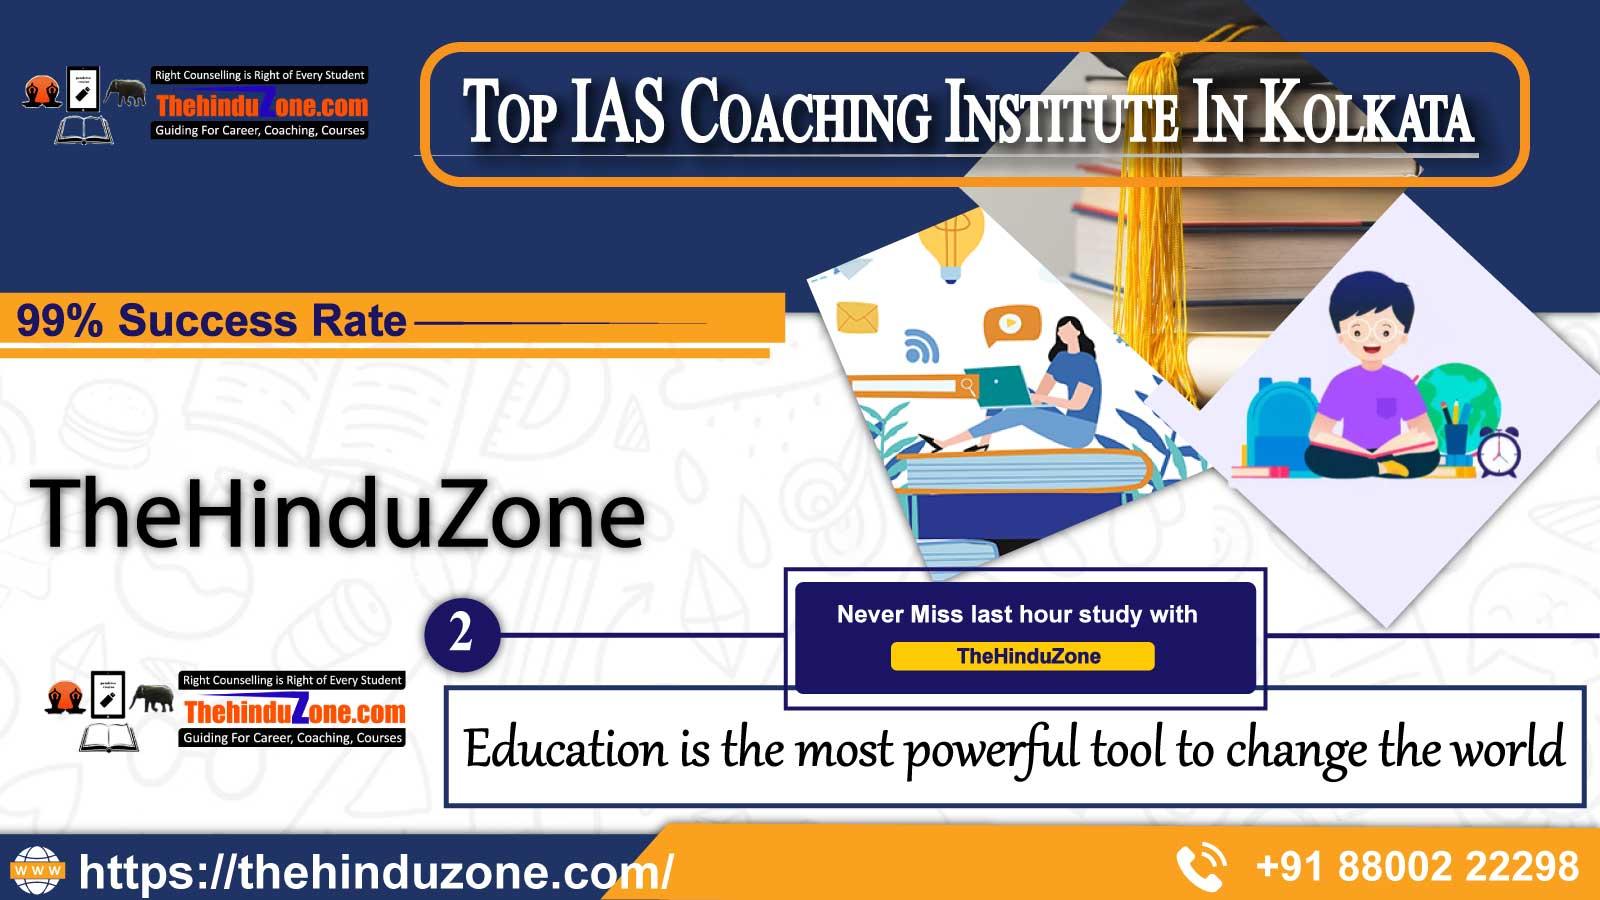 TheHinduZone – Best IAS Coaching In Kolkata